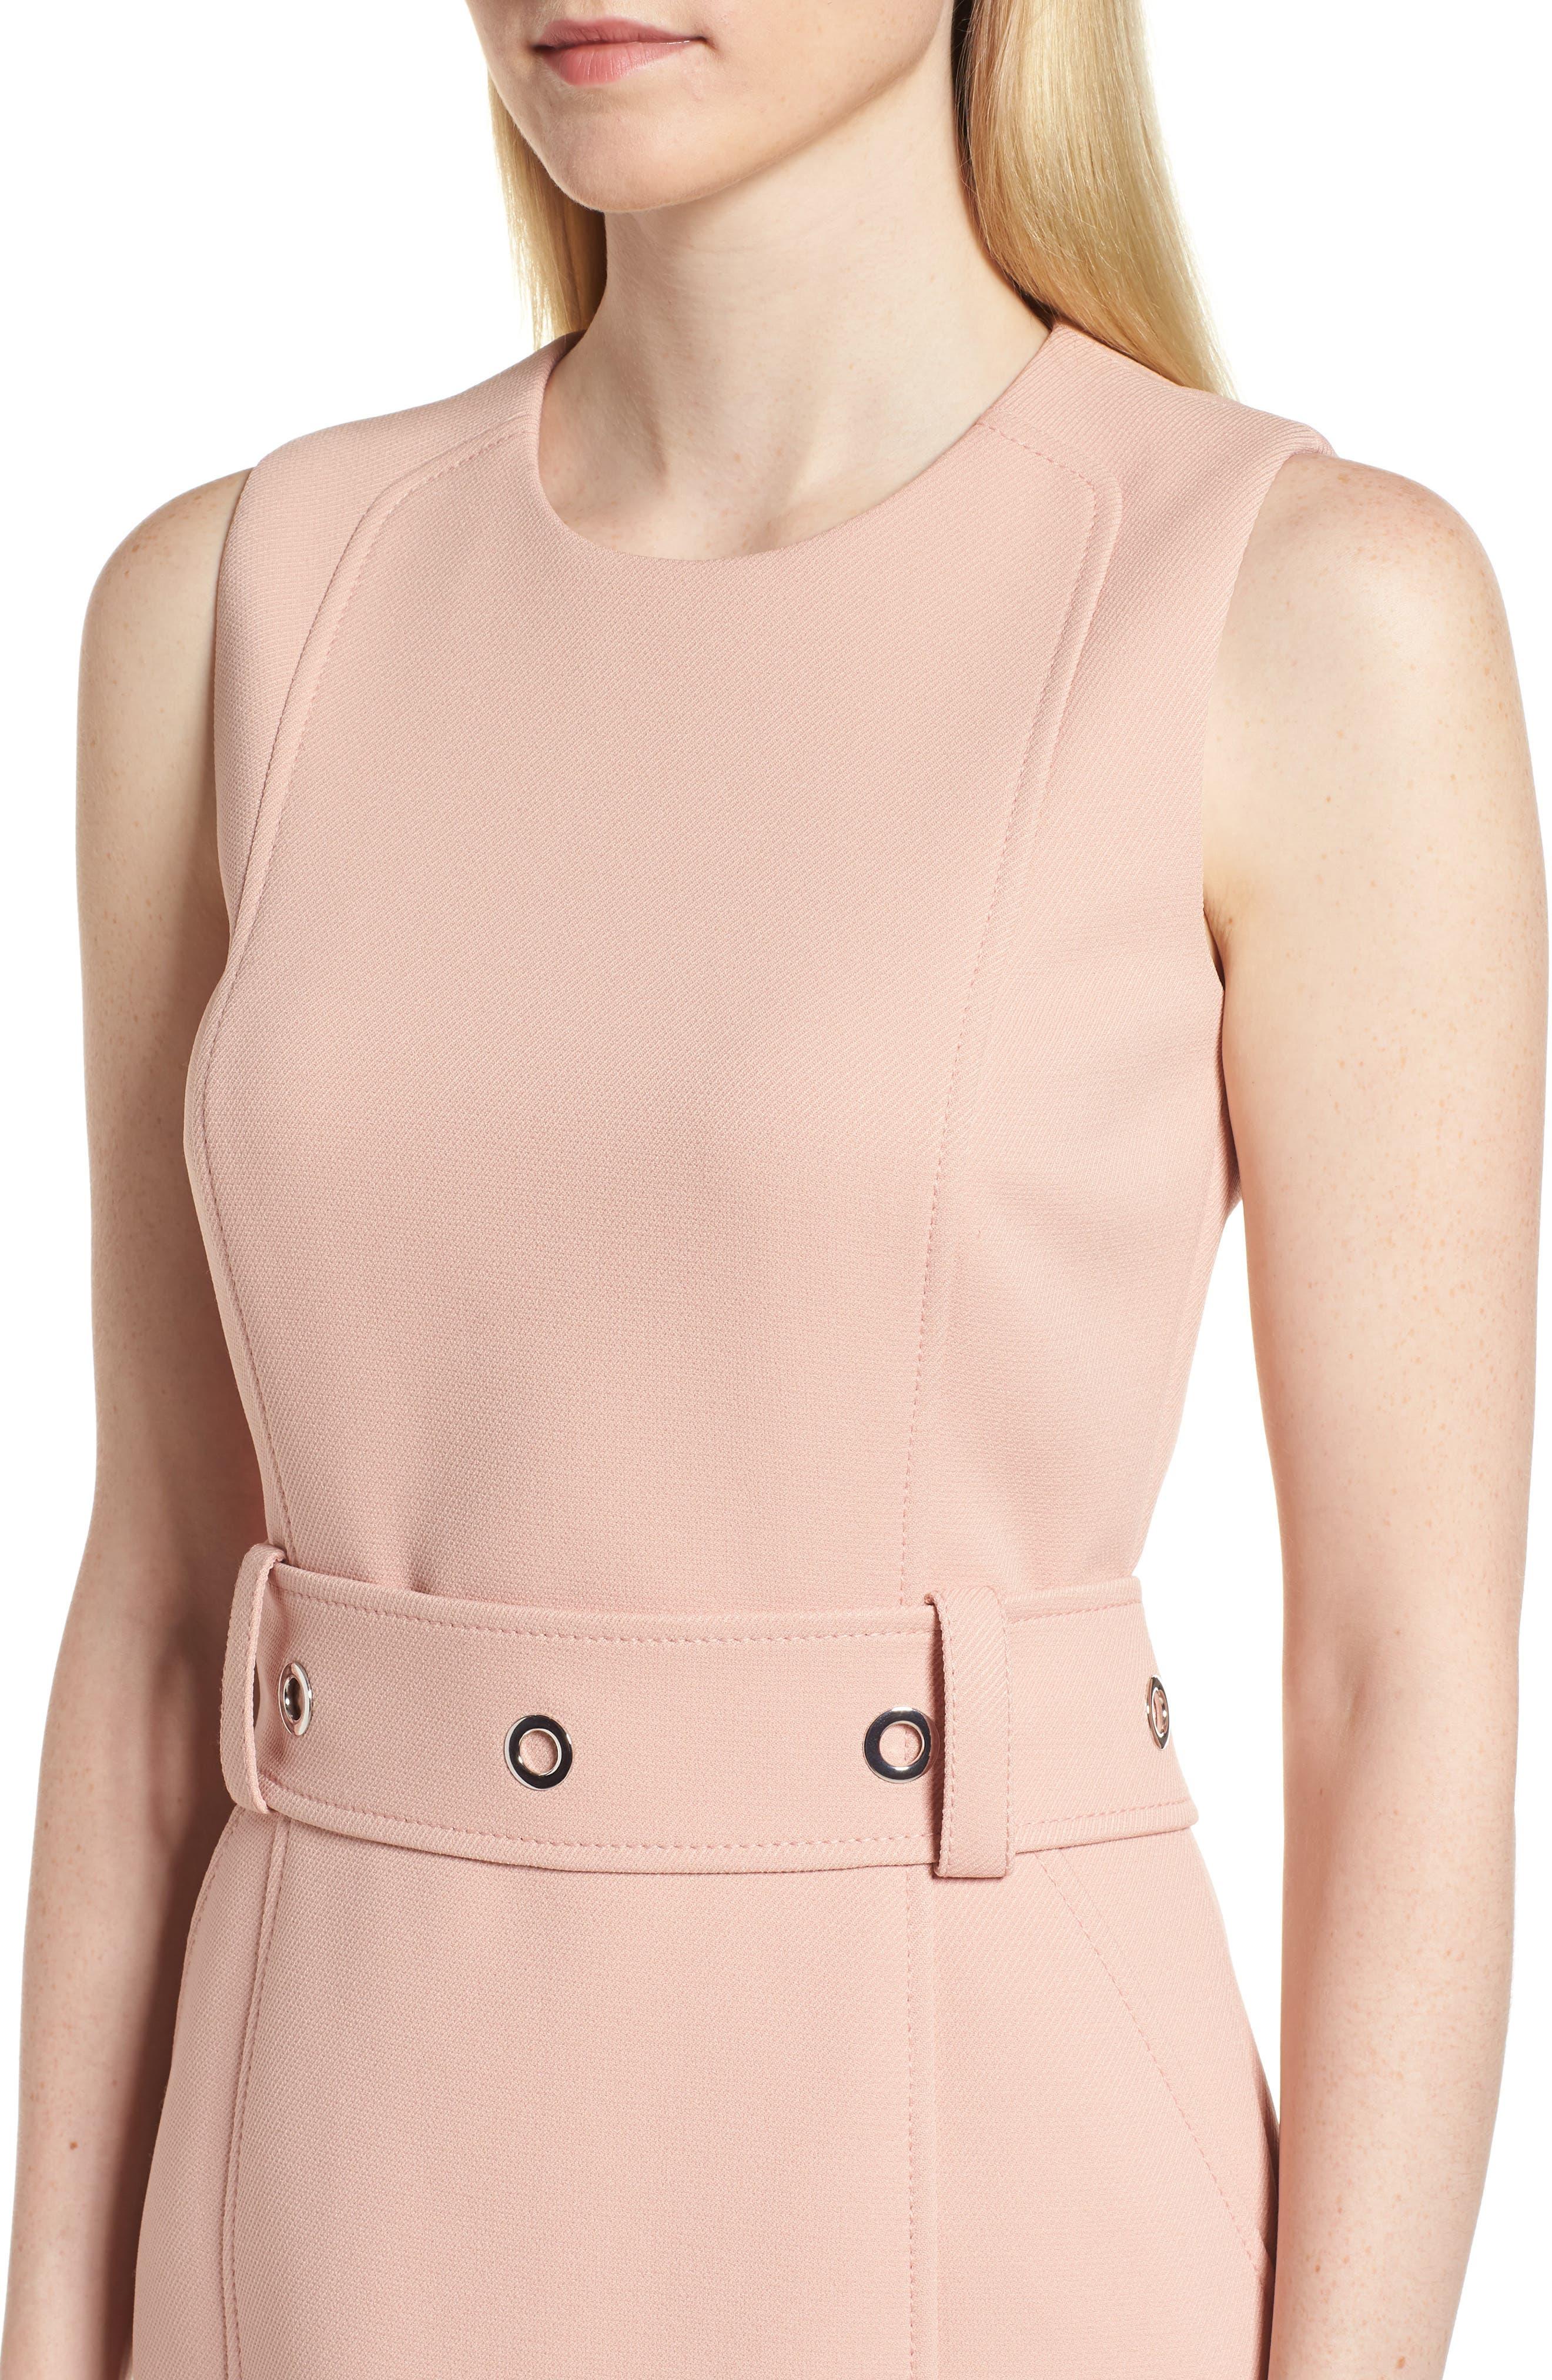 Duleama Compact Twill Dress,                             Alternate thumbnail 4, color,                             Blush